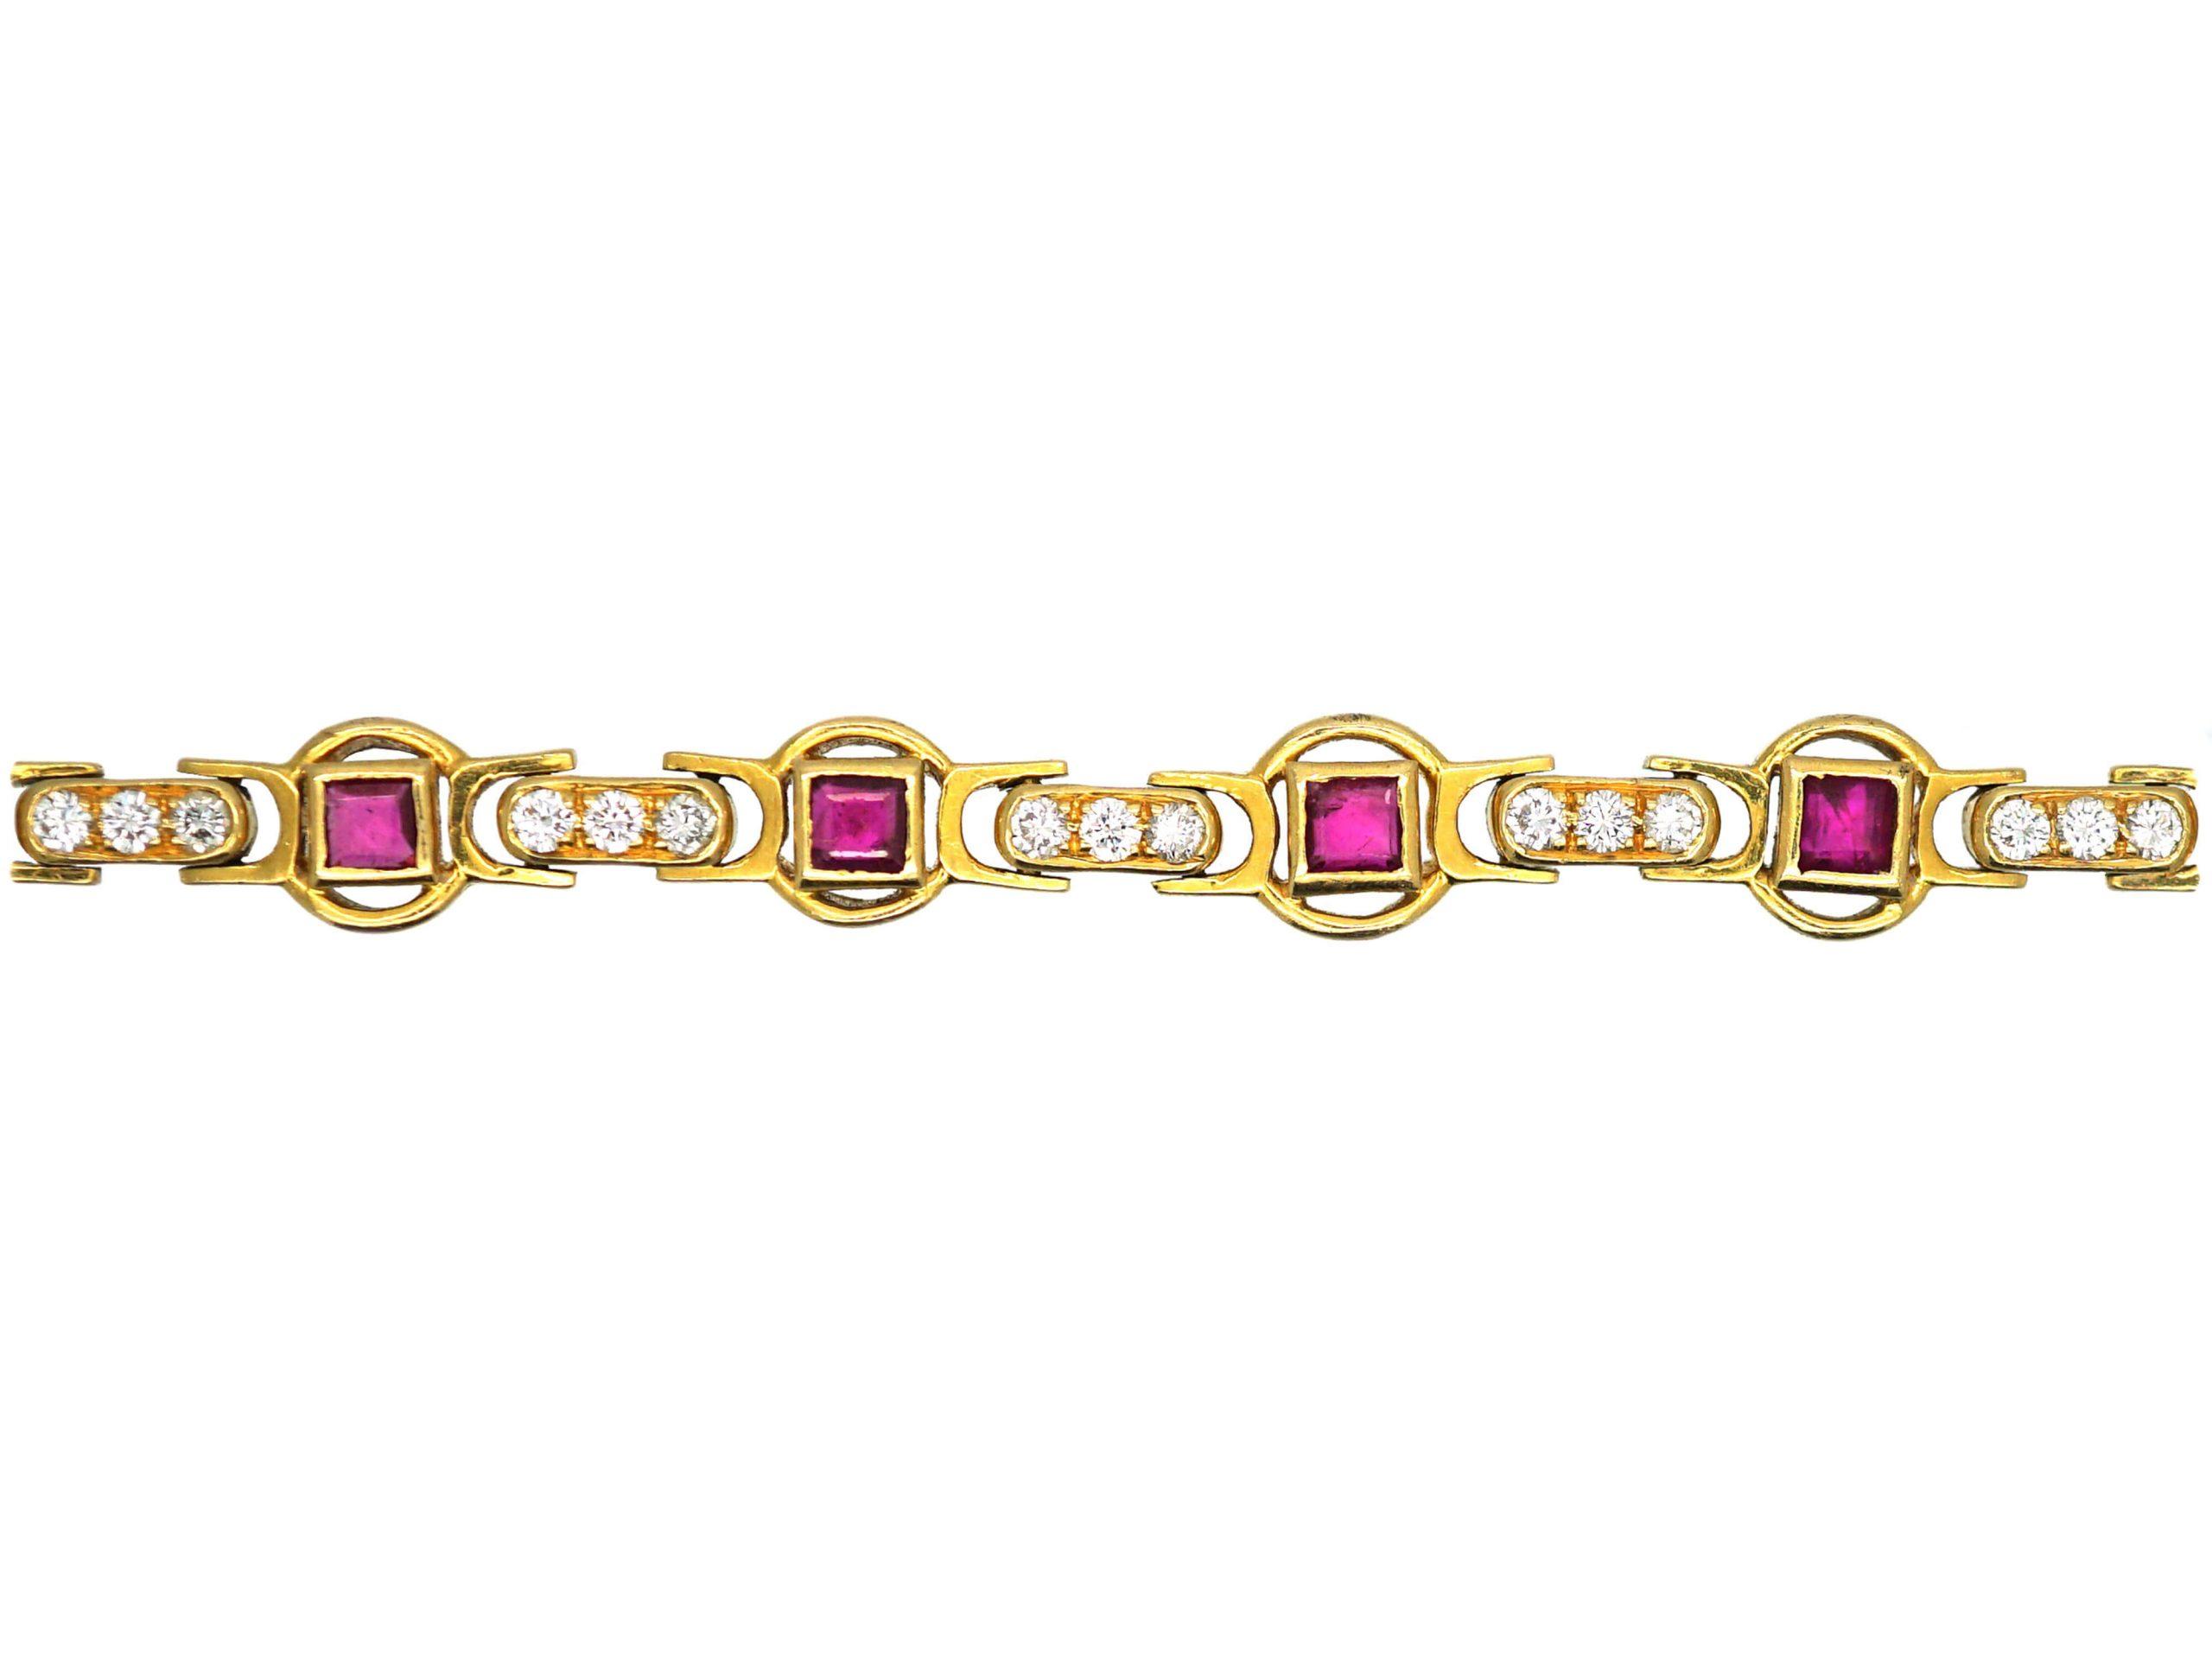 18ct Ruby & Diamond Bracelet